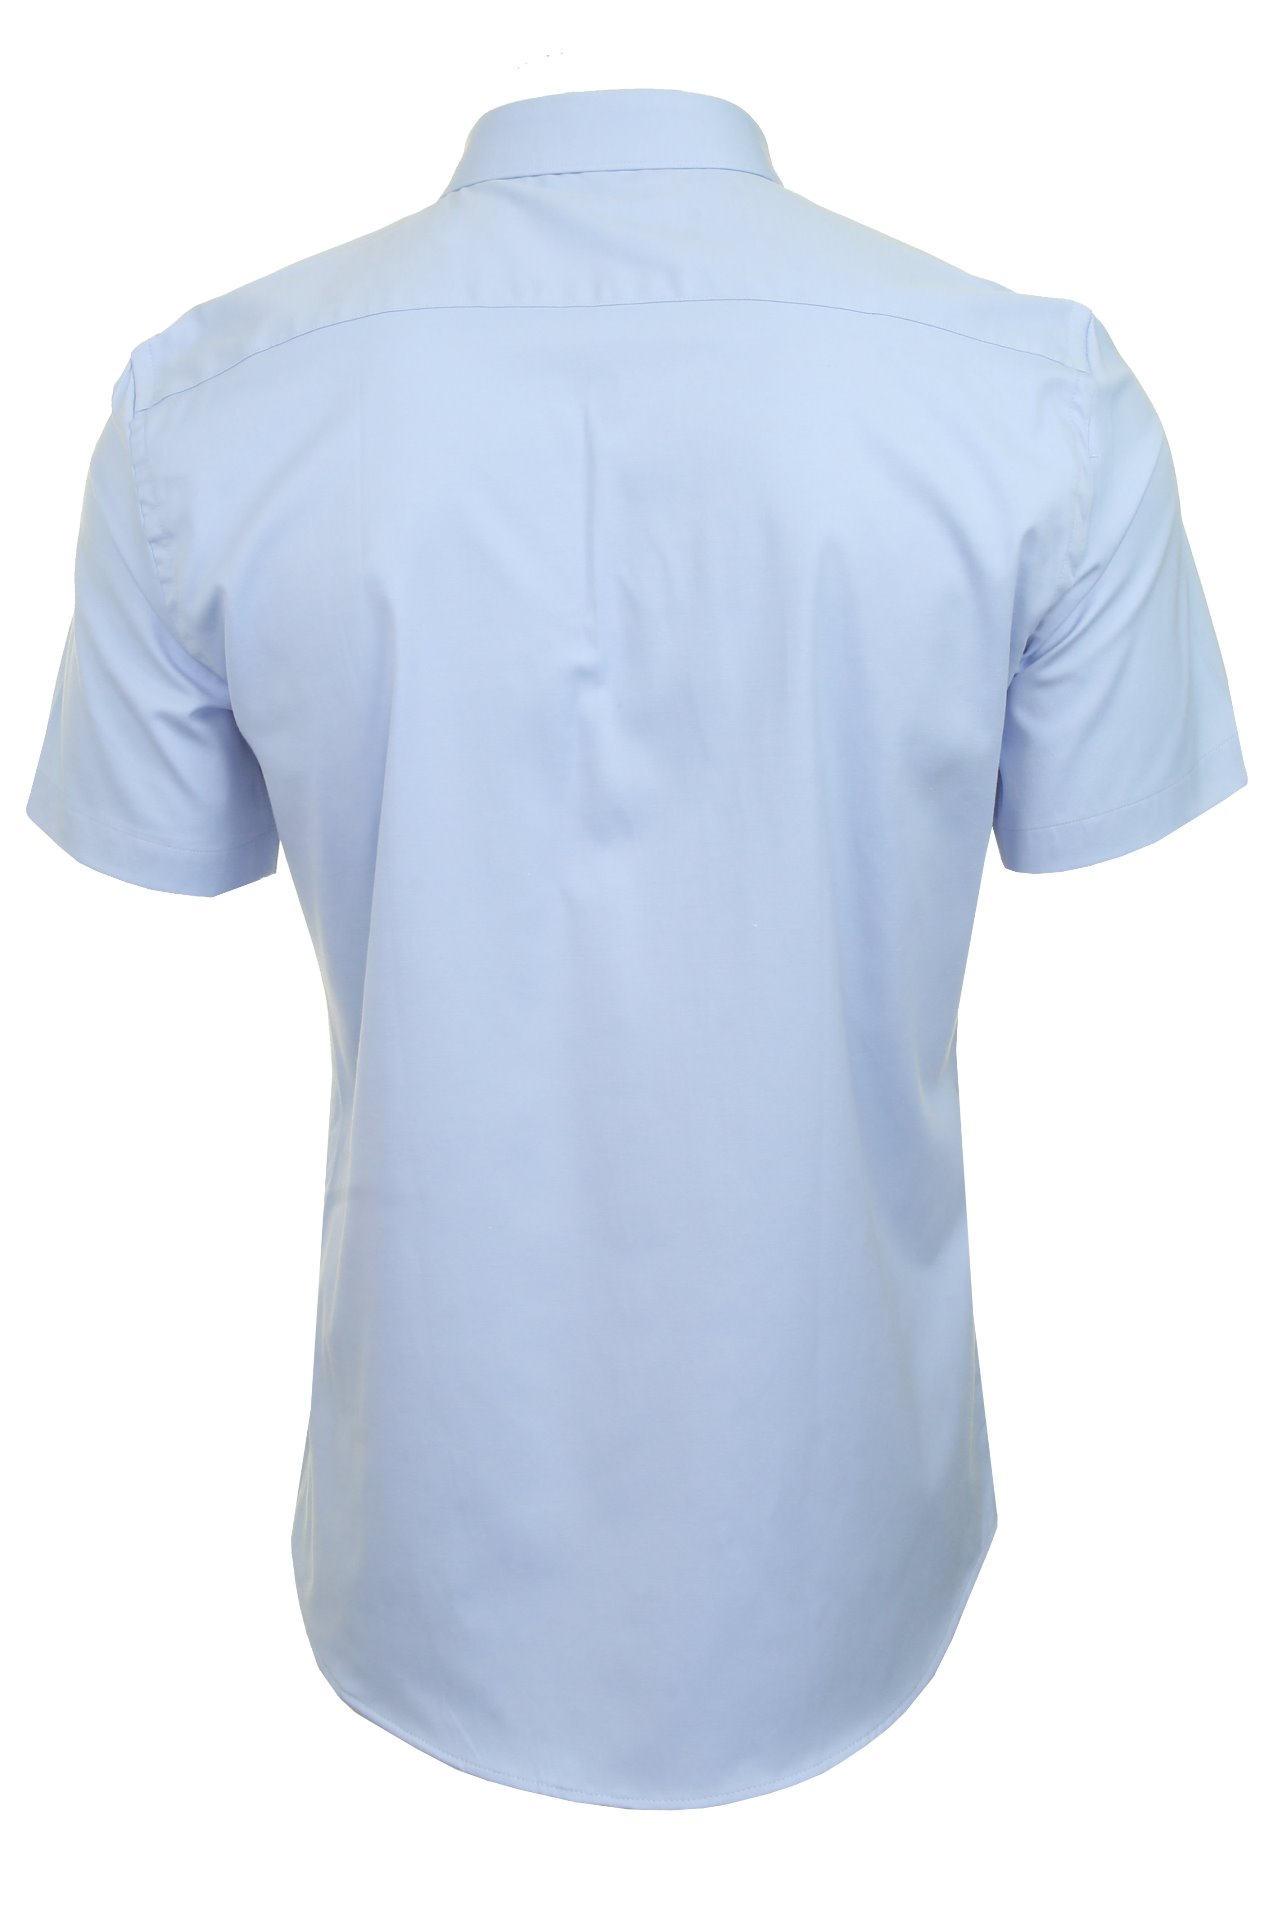 Xact-para-Hombre-de-Manga-Corta-Camisa-Slim-Fit-Popelin-del-estiramiento miniatura 10